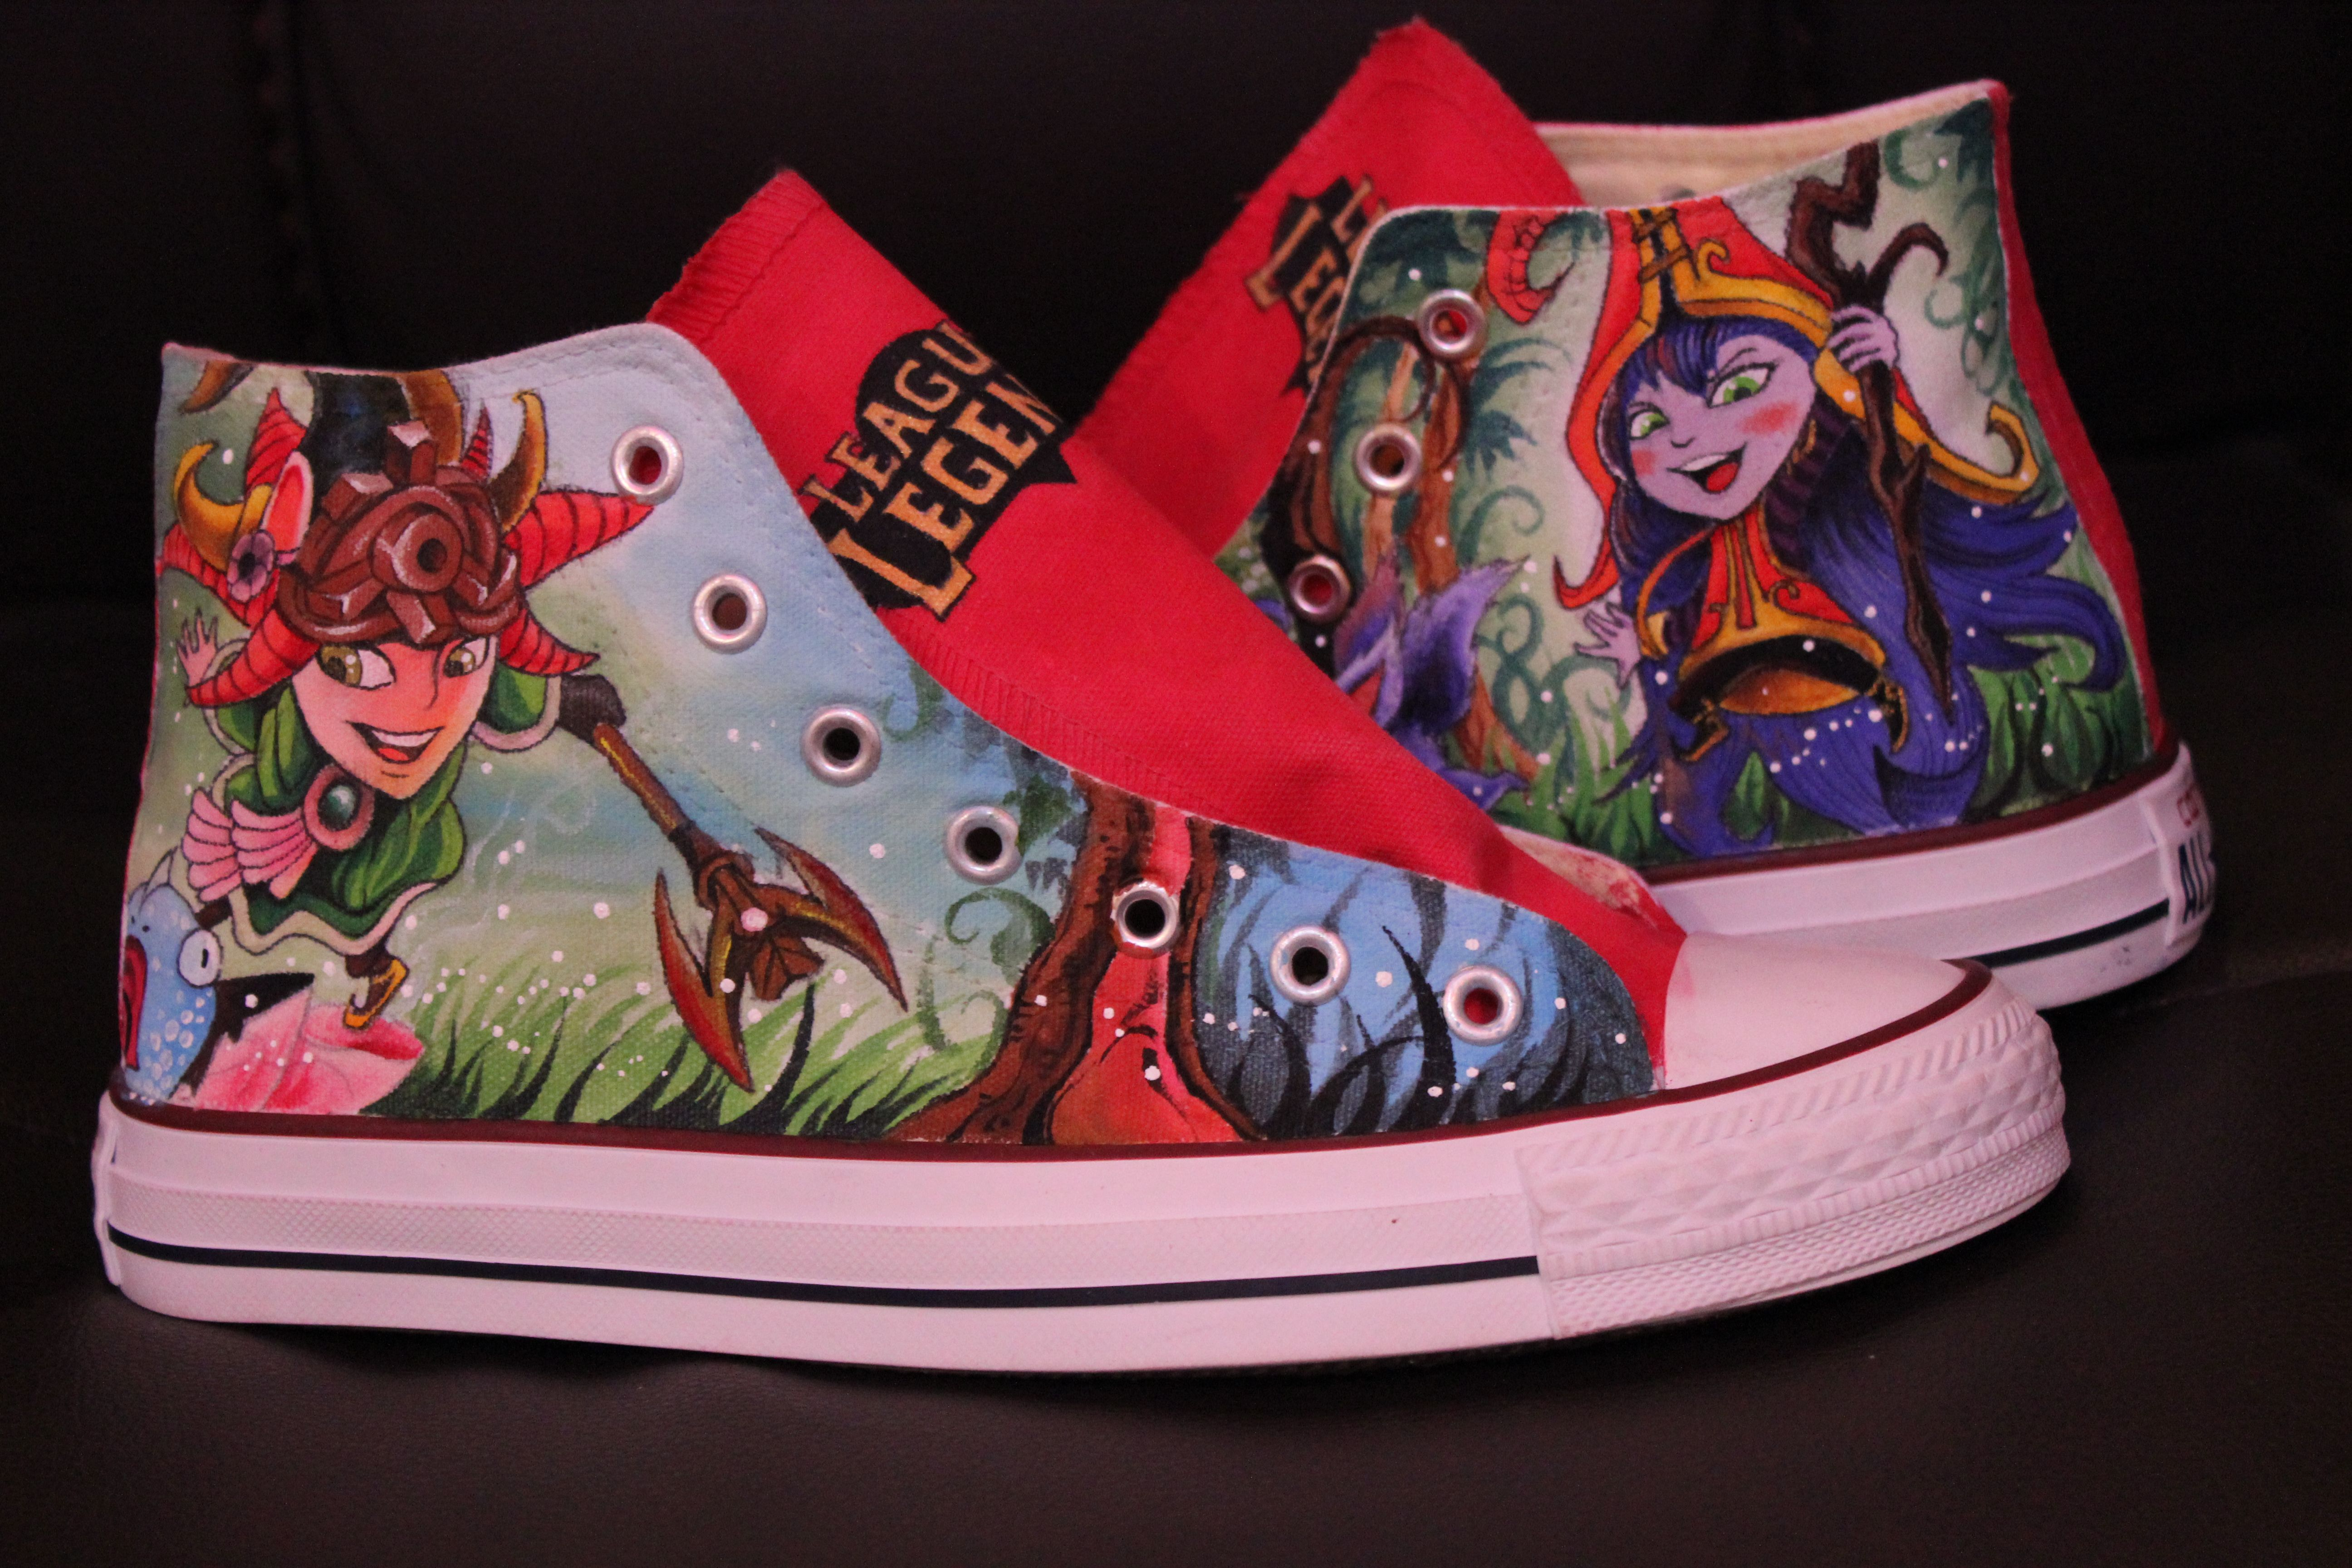 07cb8625e3f5 League of Legends High Top Converse Shoes Custom Converse Painte ...